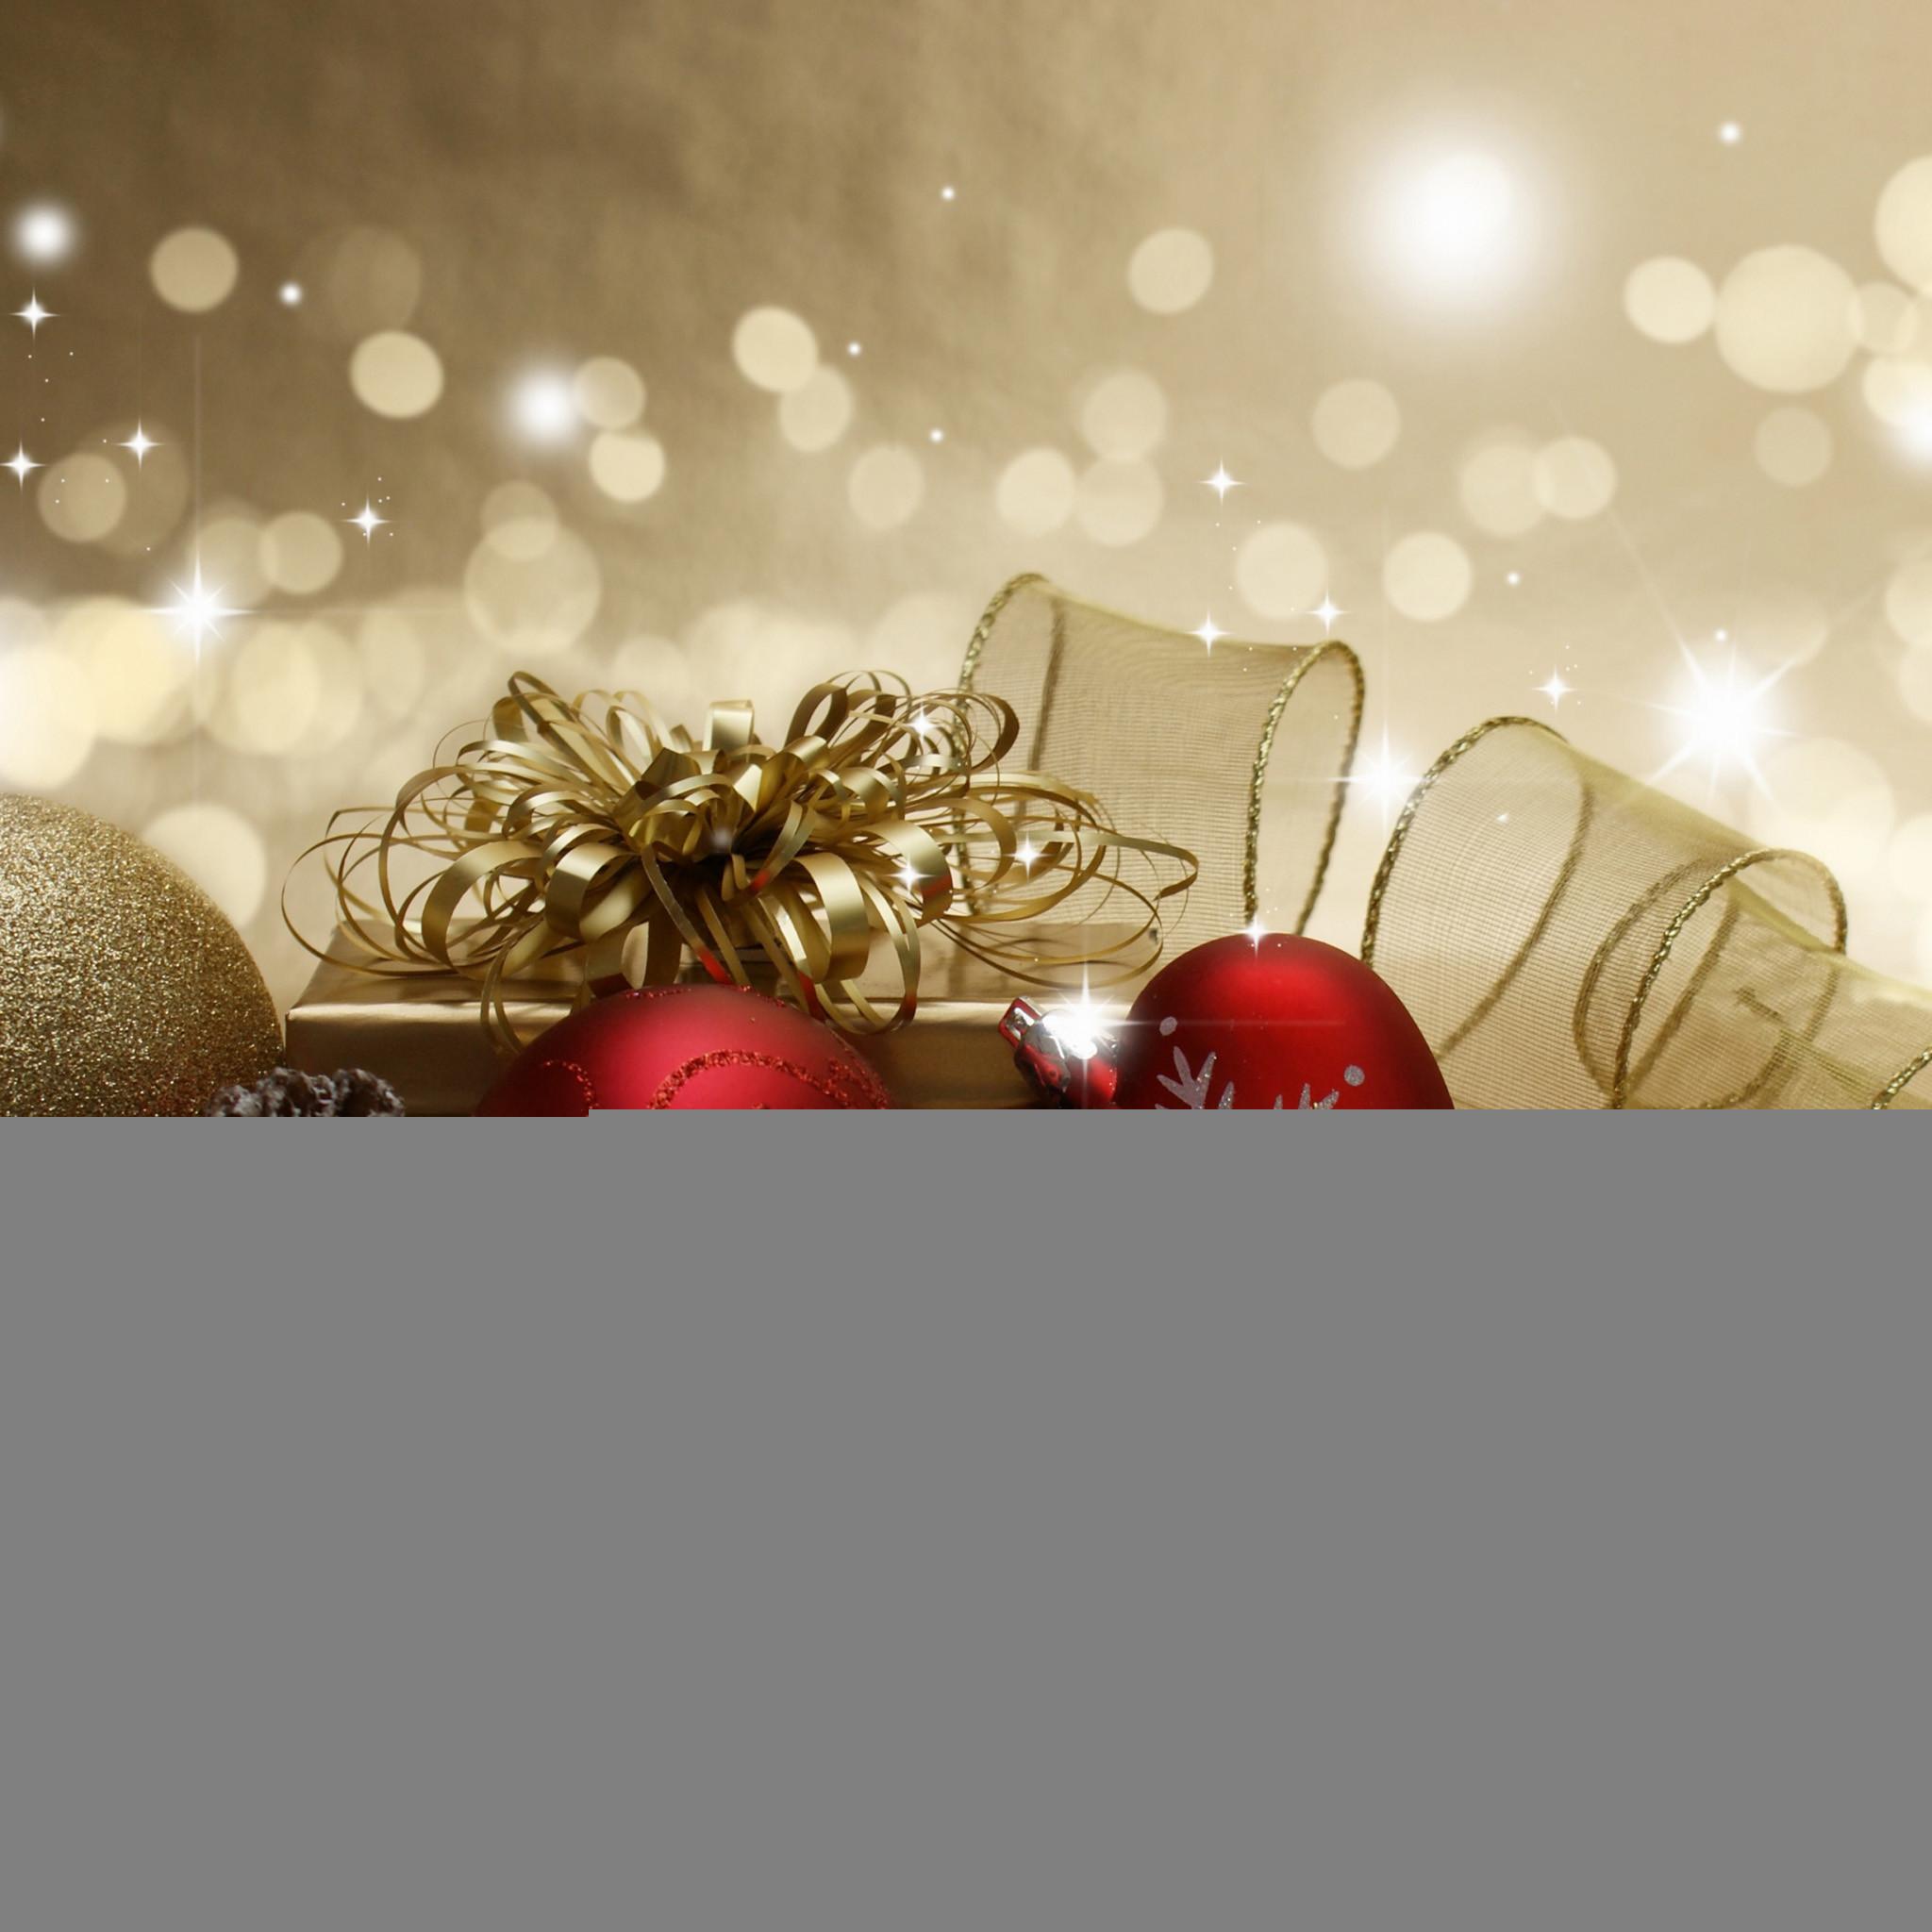 … christmas love ipad air wallpaper download iphone wallpapers …